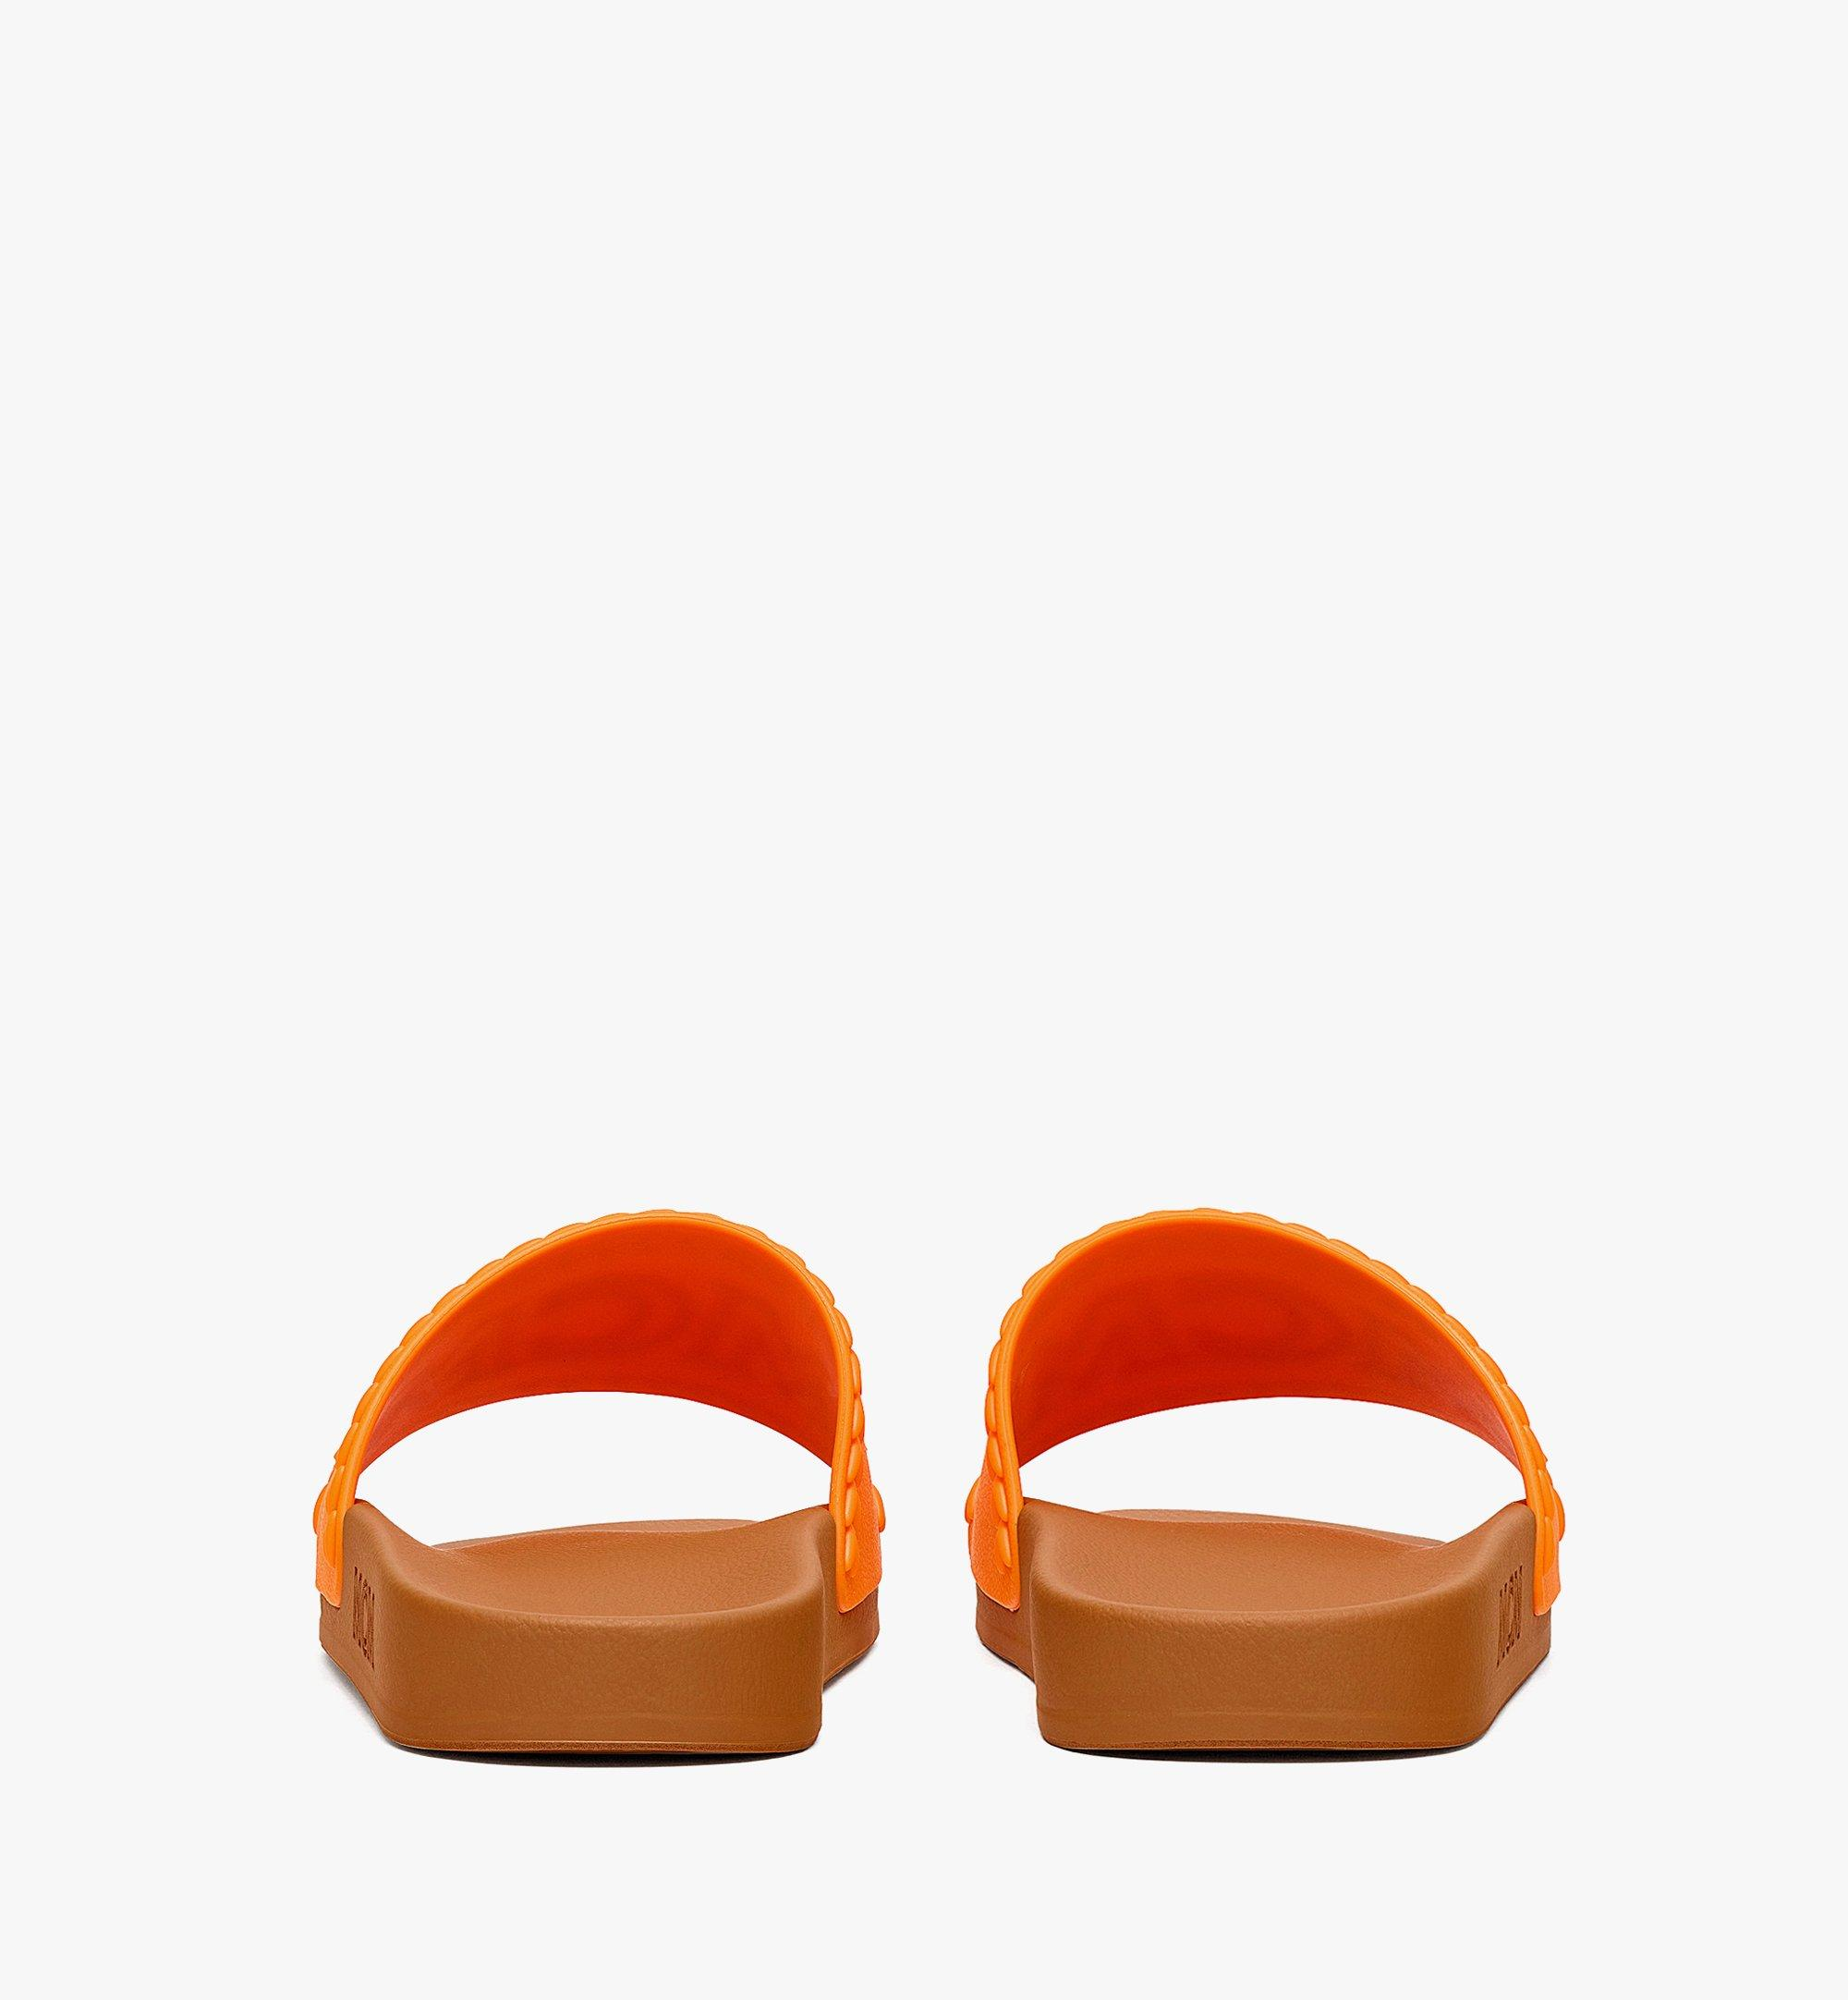 MCM 女士 Big Logo 橡膠拖鞋 Orange MESBSMM15O9036 更多視圖 2